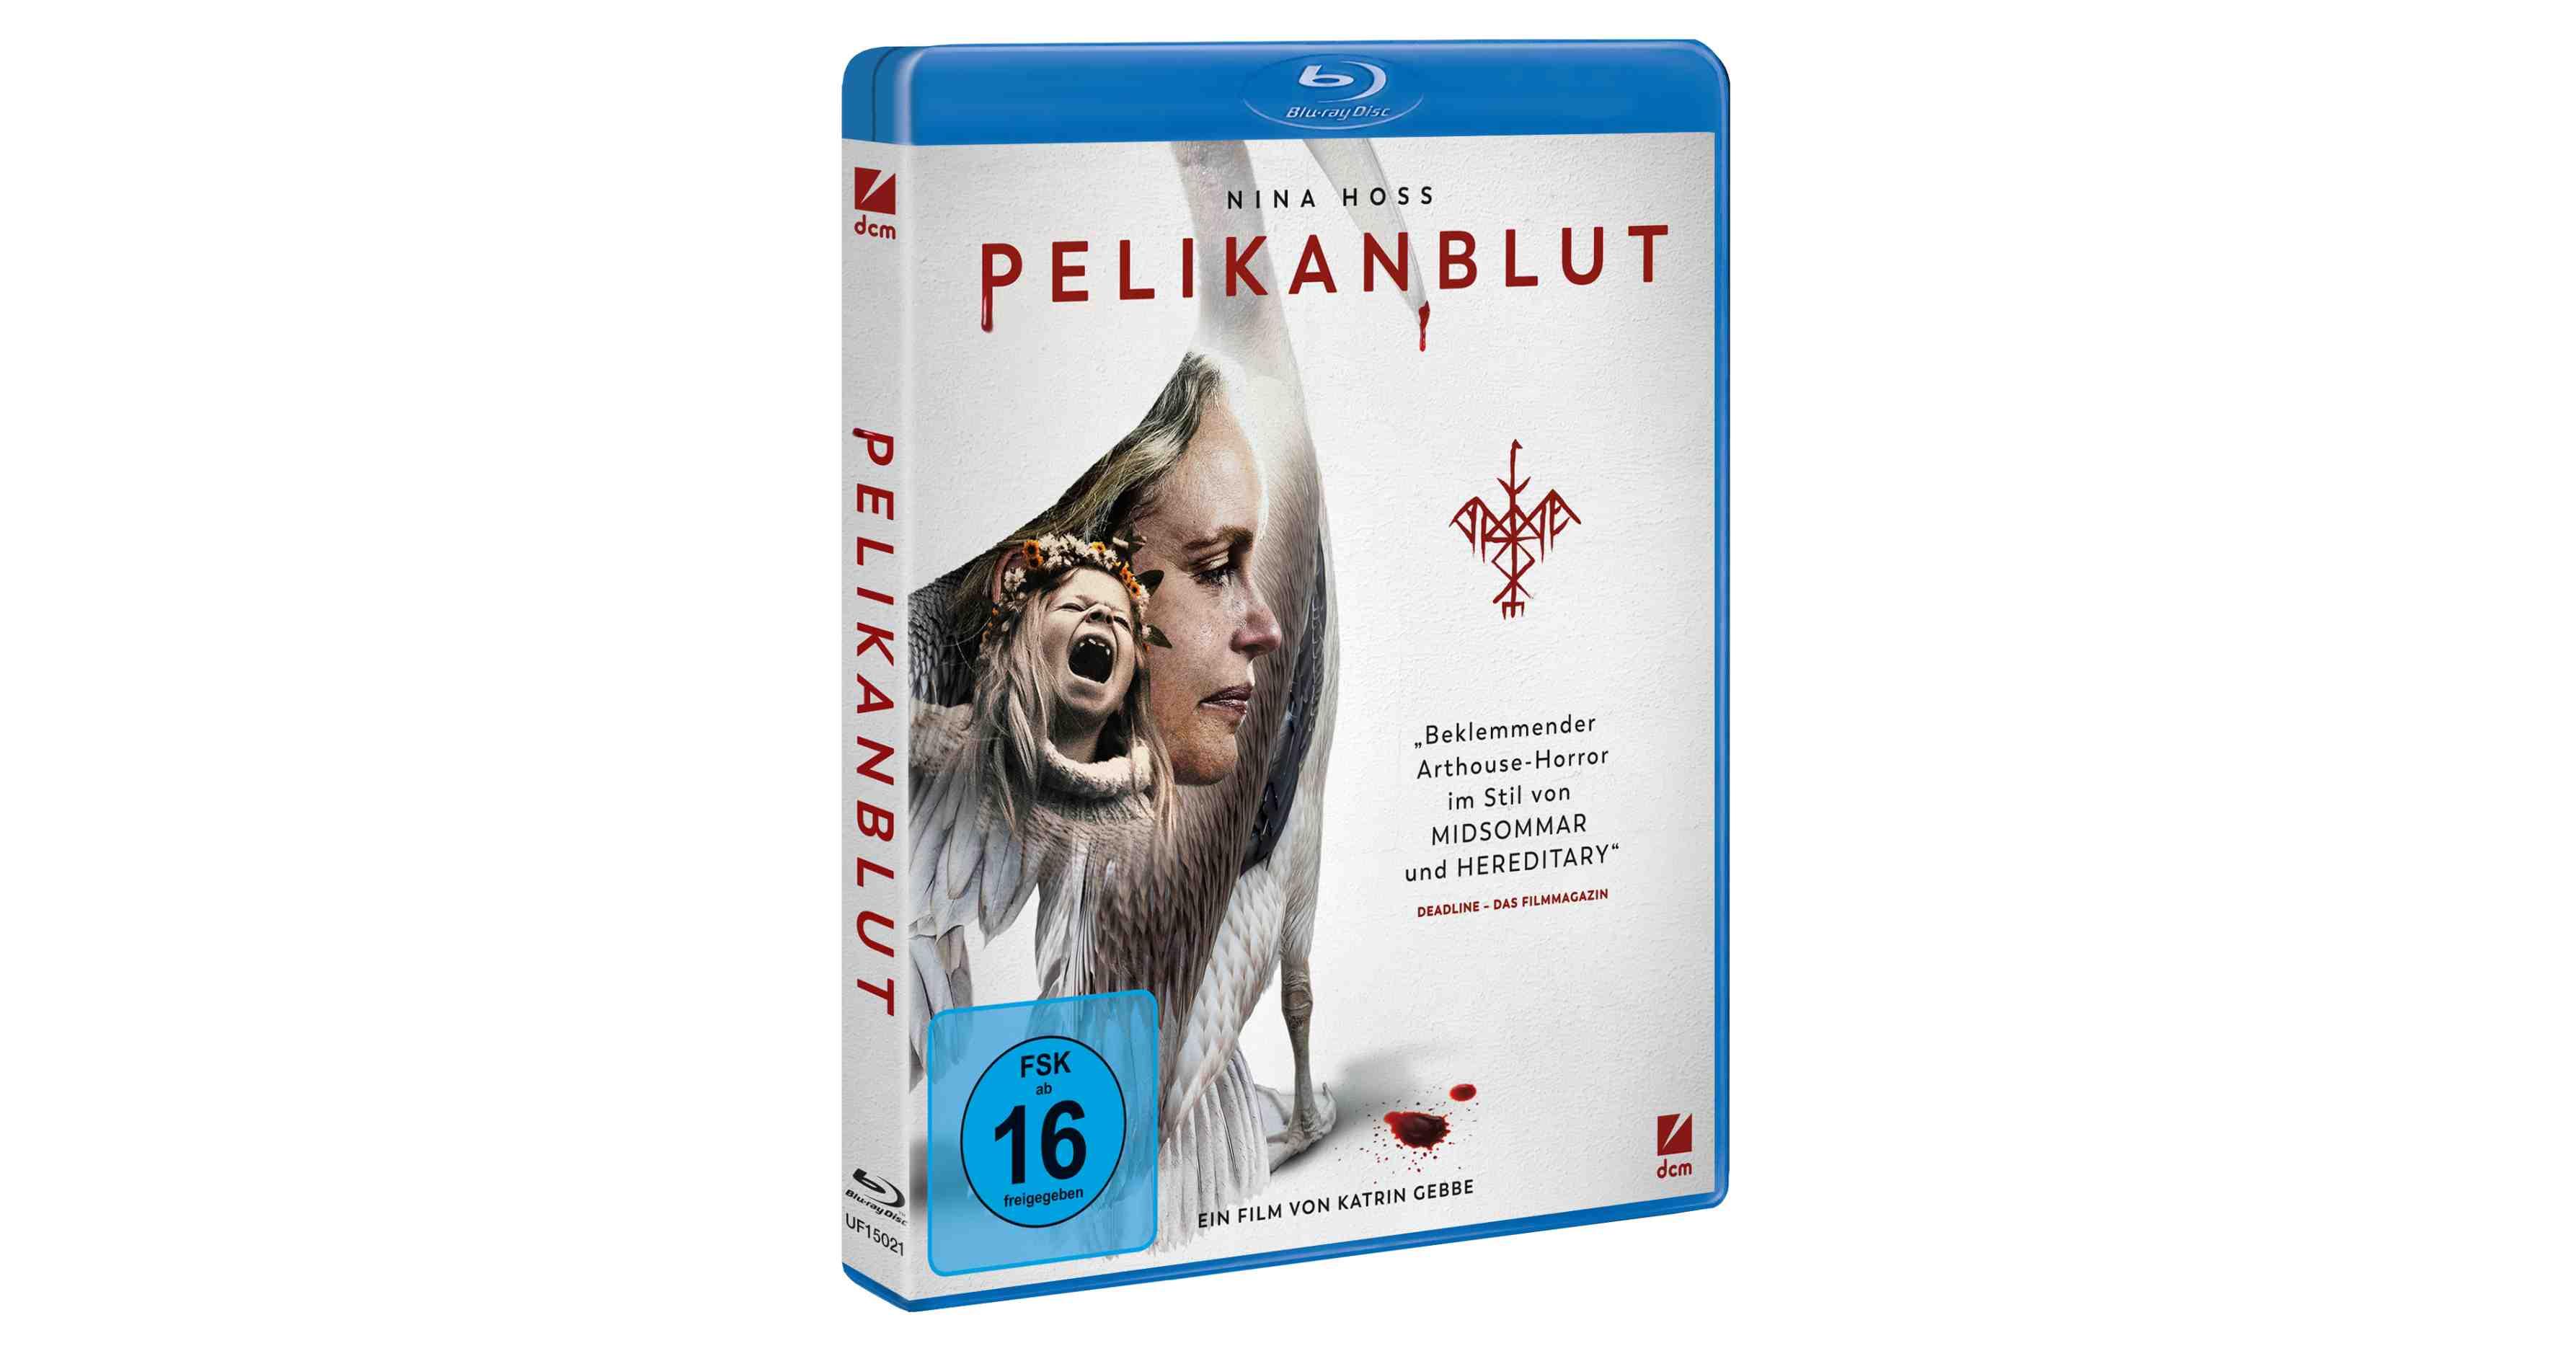 Pelikanblut-Packshot-dcm